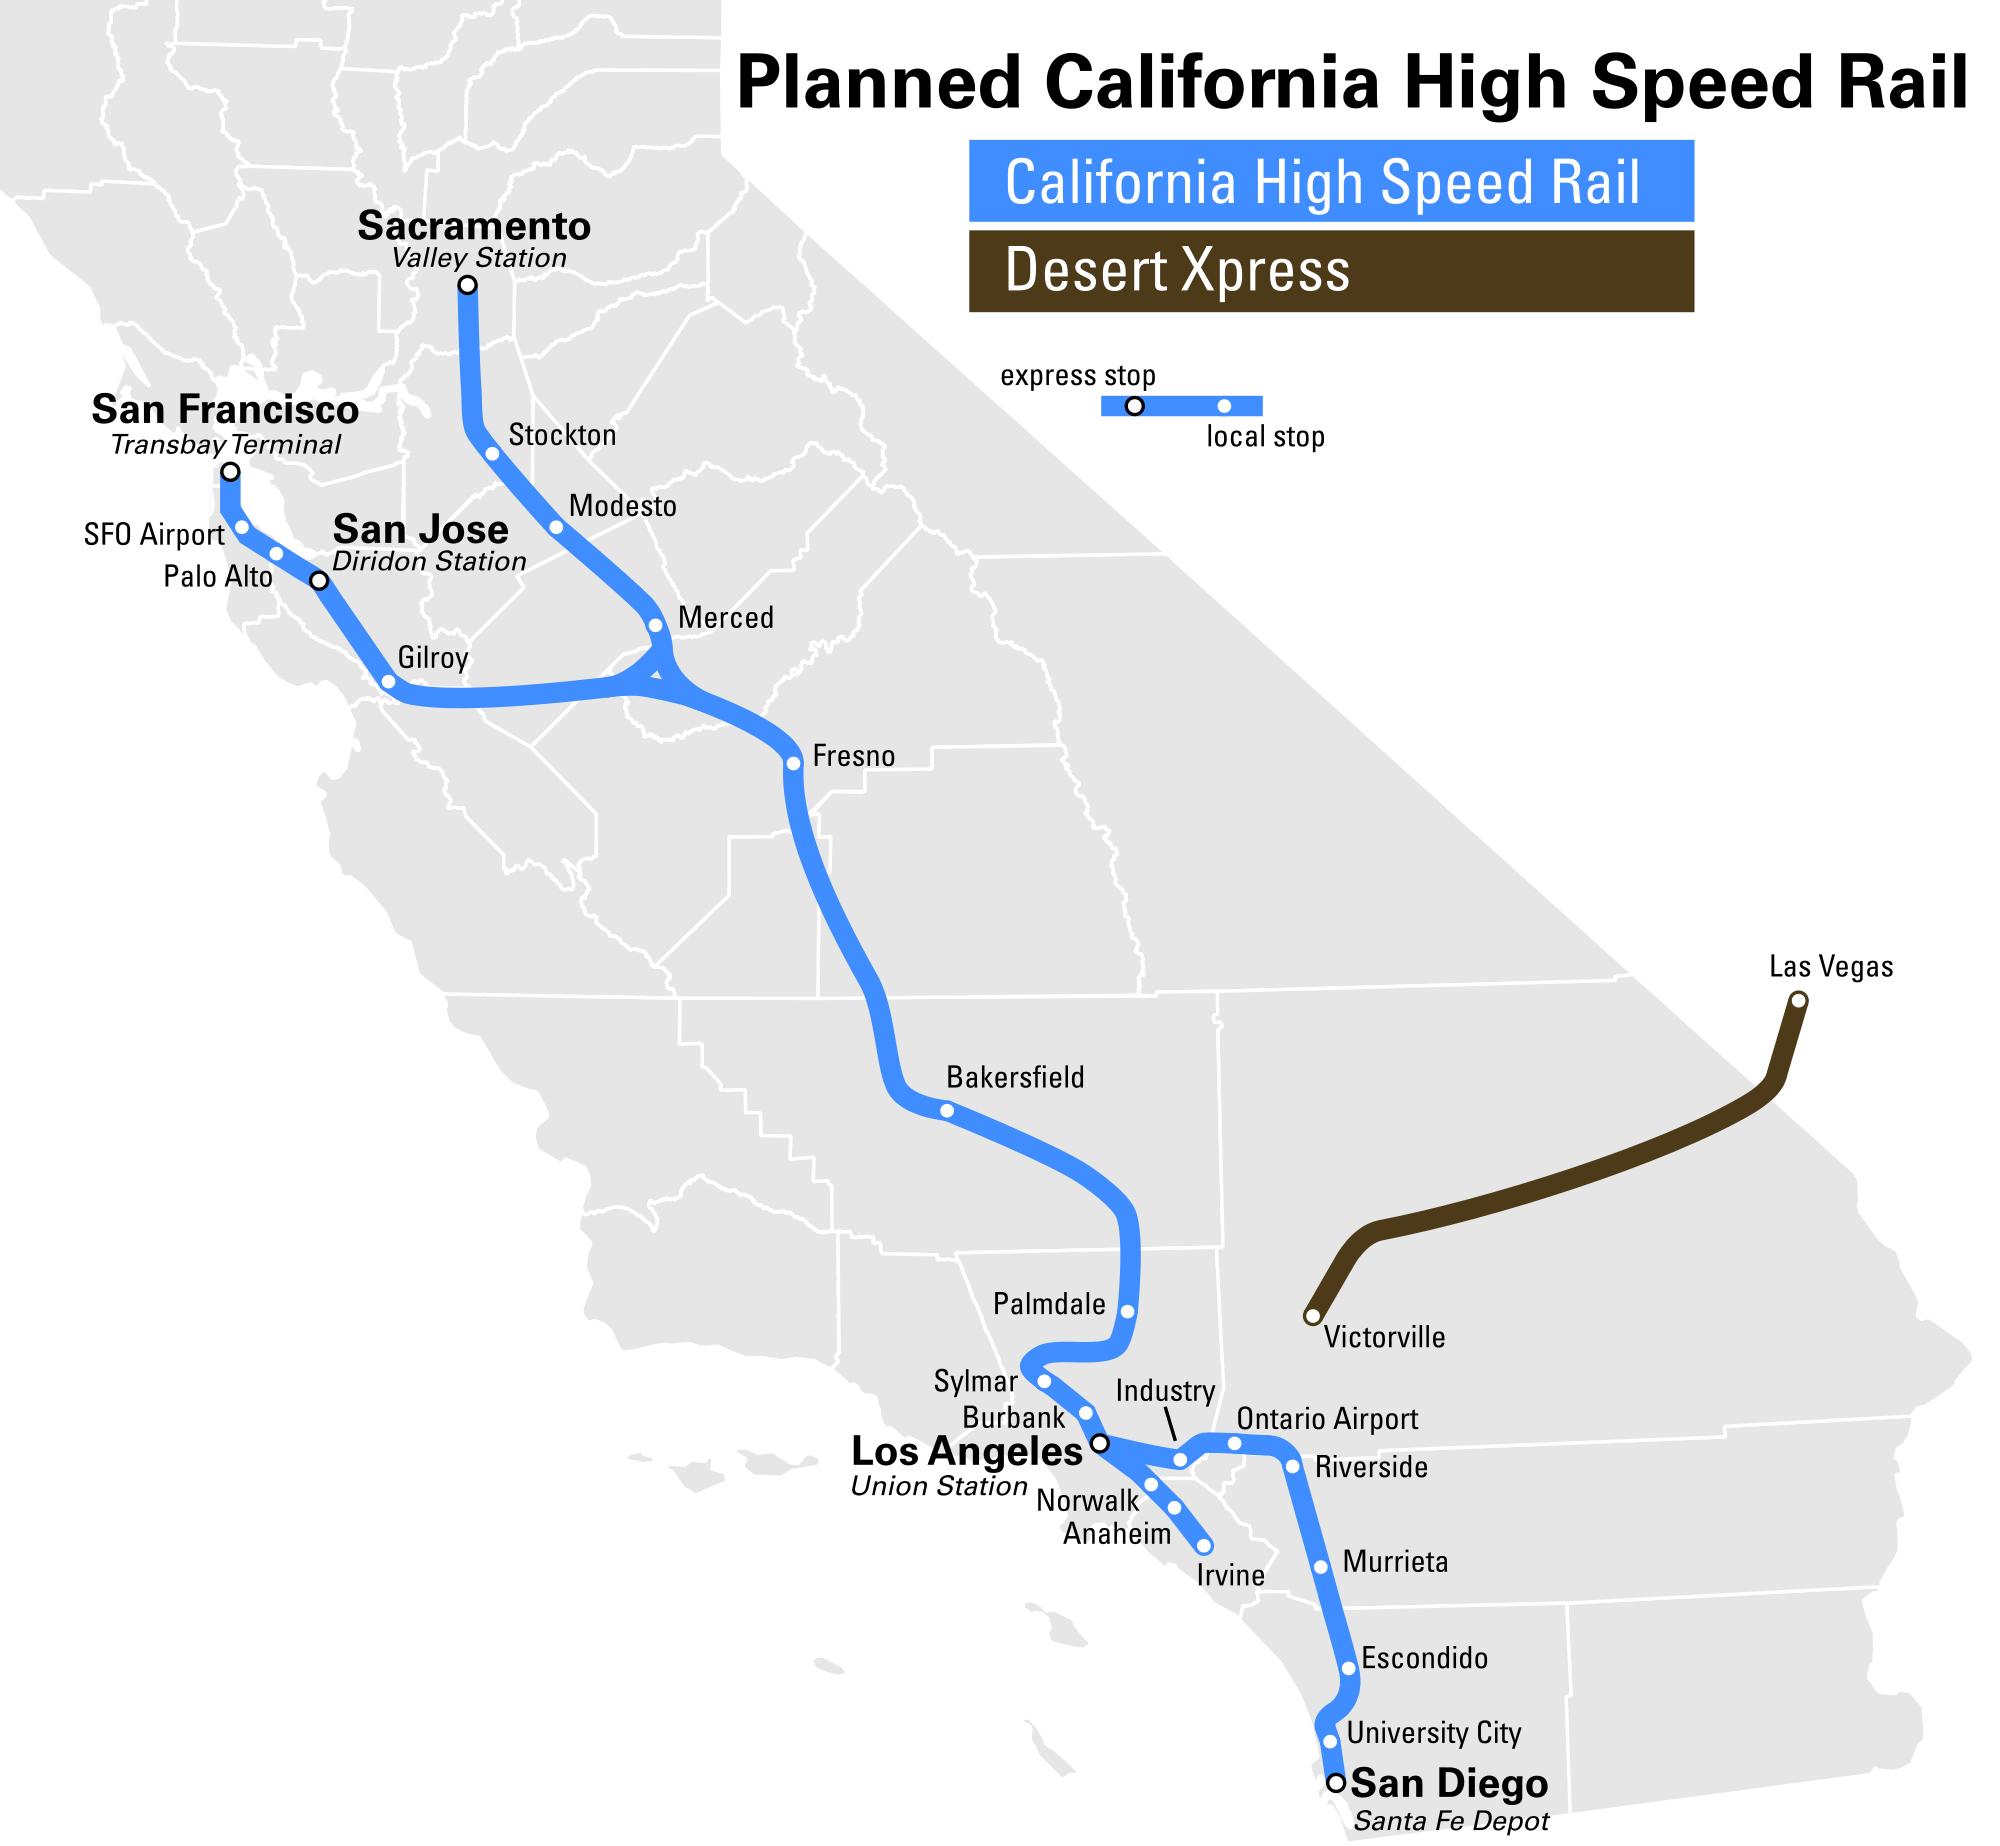 Xpresswest High Speed Rail California State Map High Speed Rail Map - California Bullet Train Map